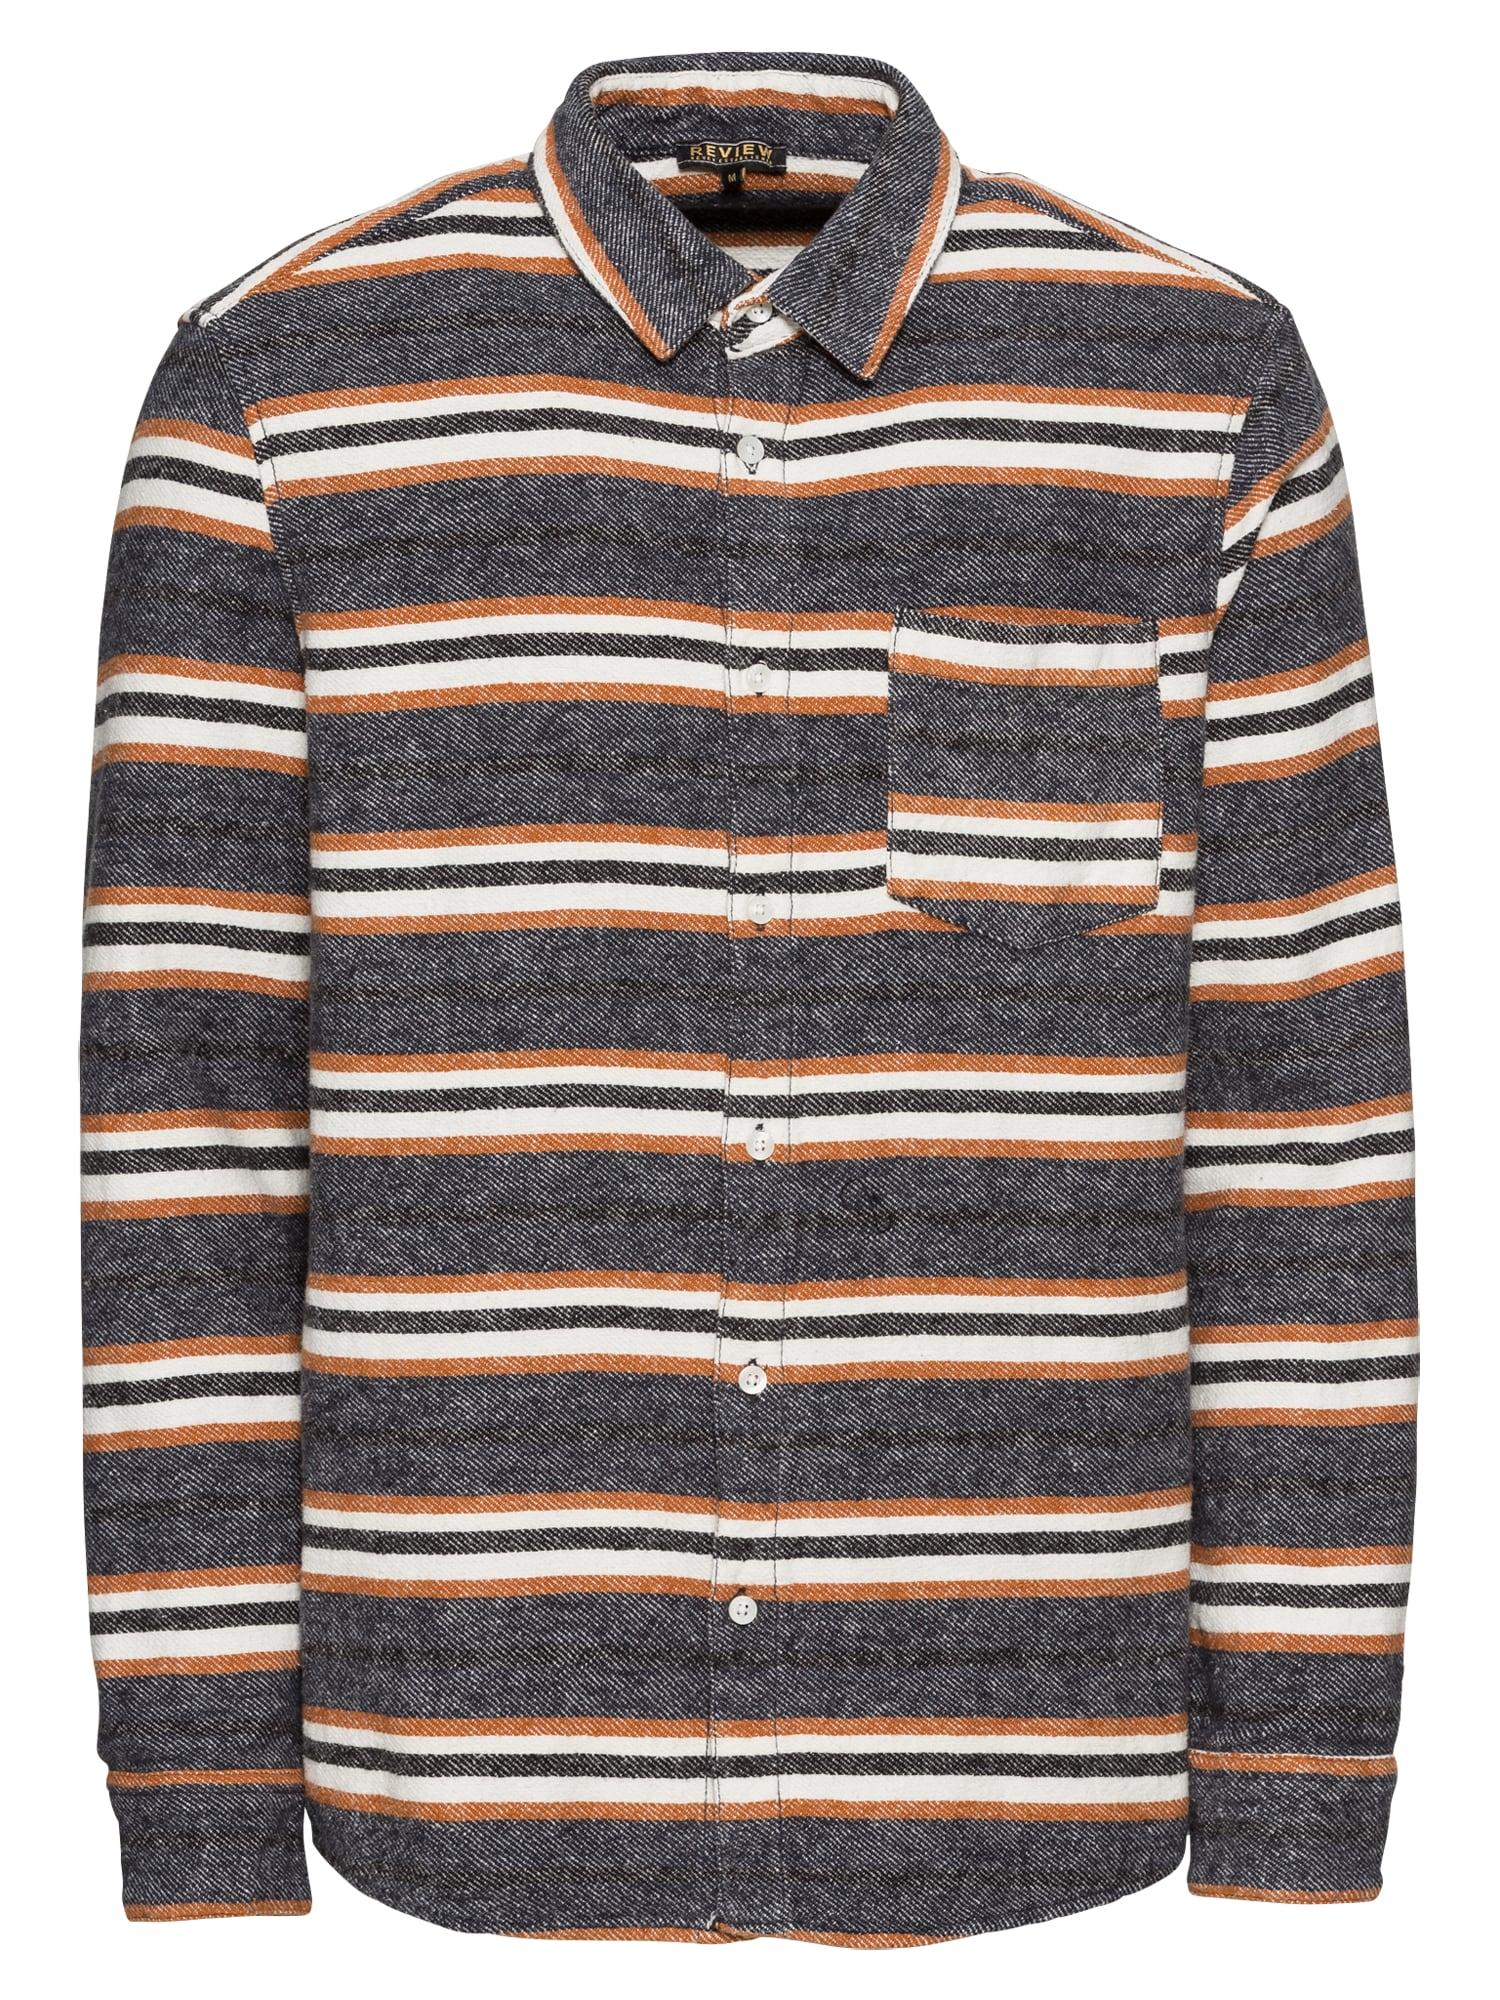 Košile STRIPE SHIRT šedá oranžová černá Review